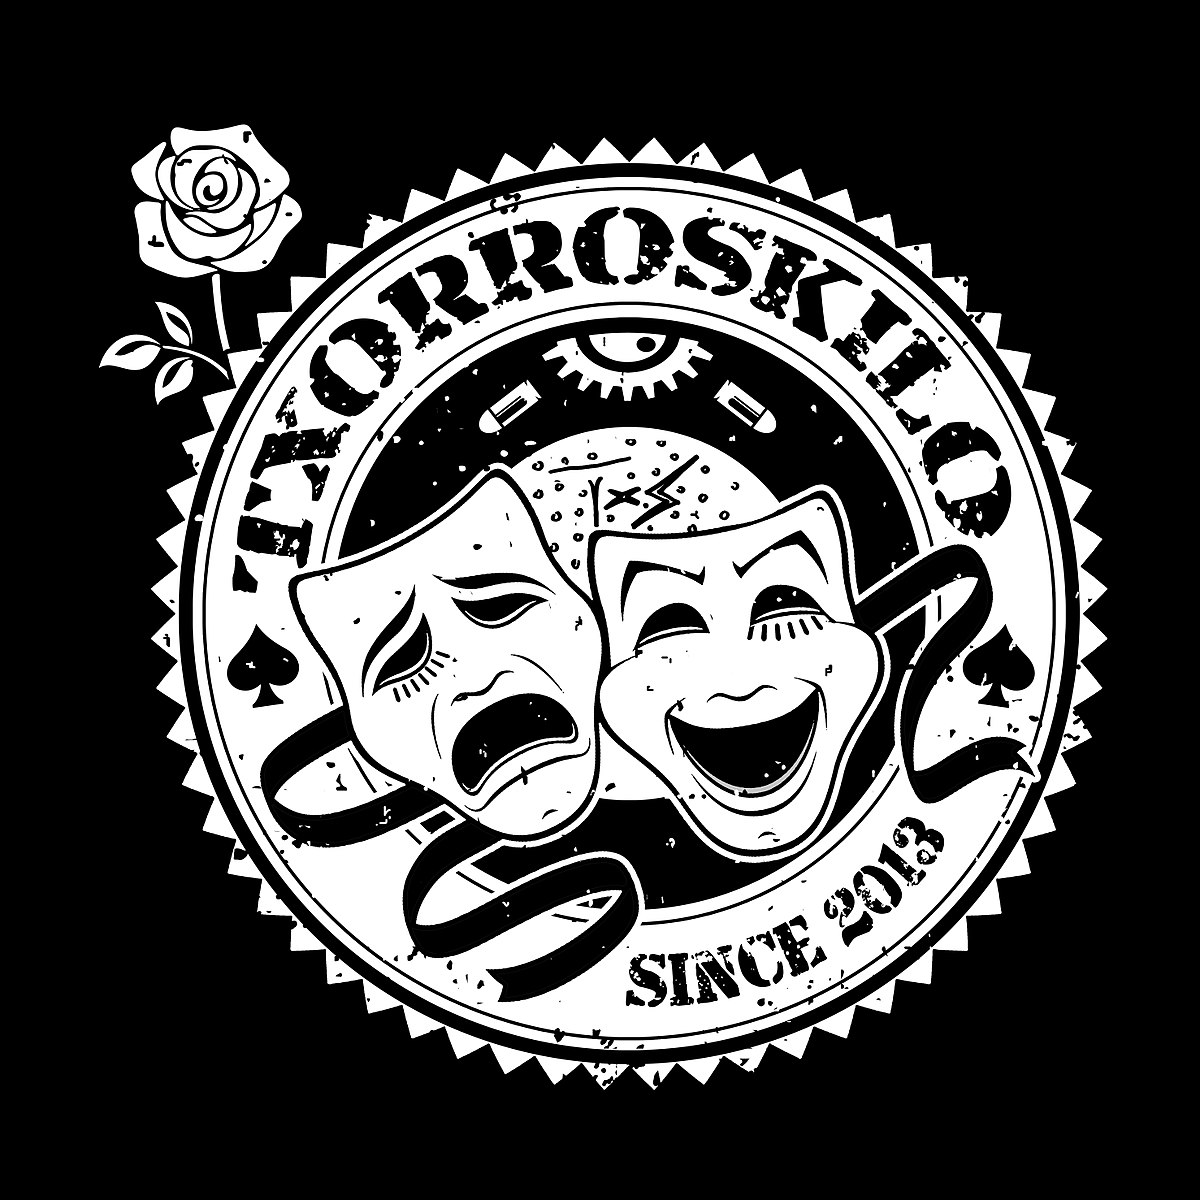 Txorroskilo Wikipedia Entziklopedia Askea